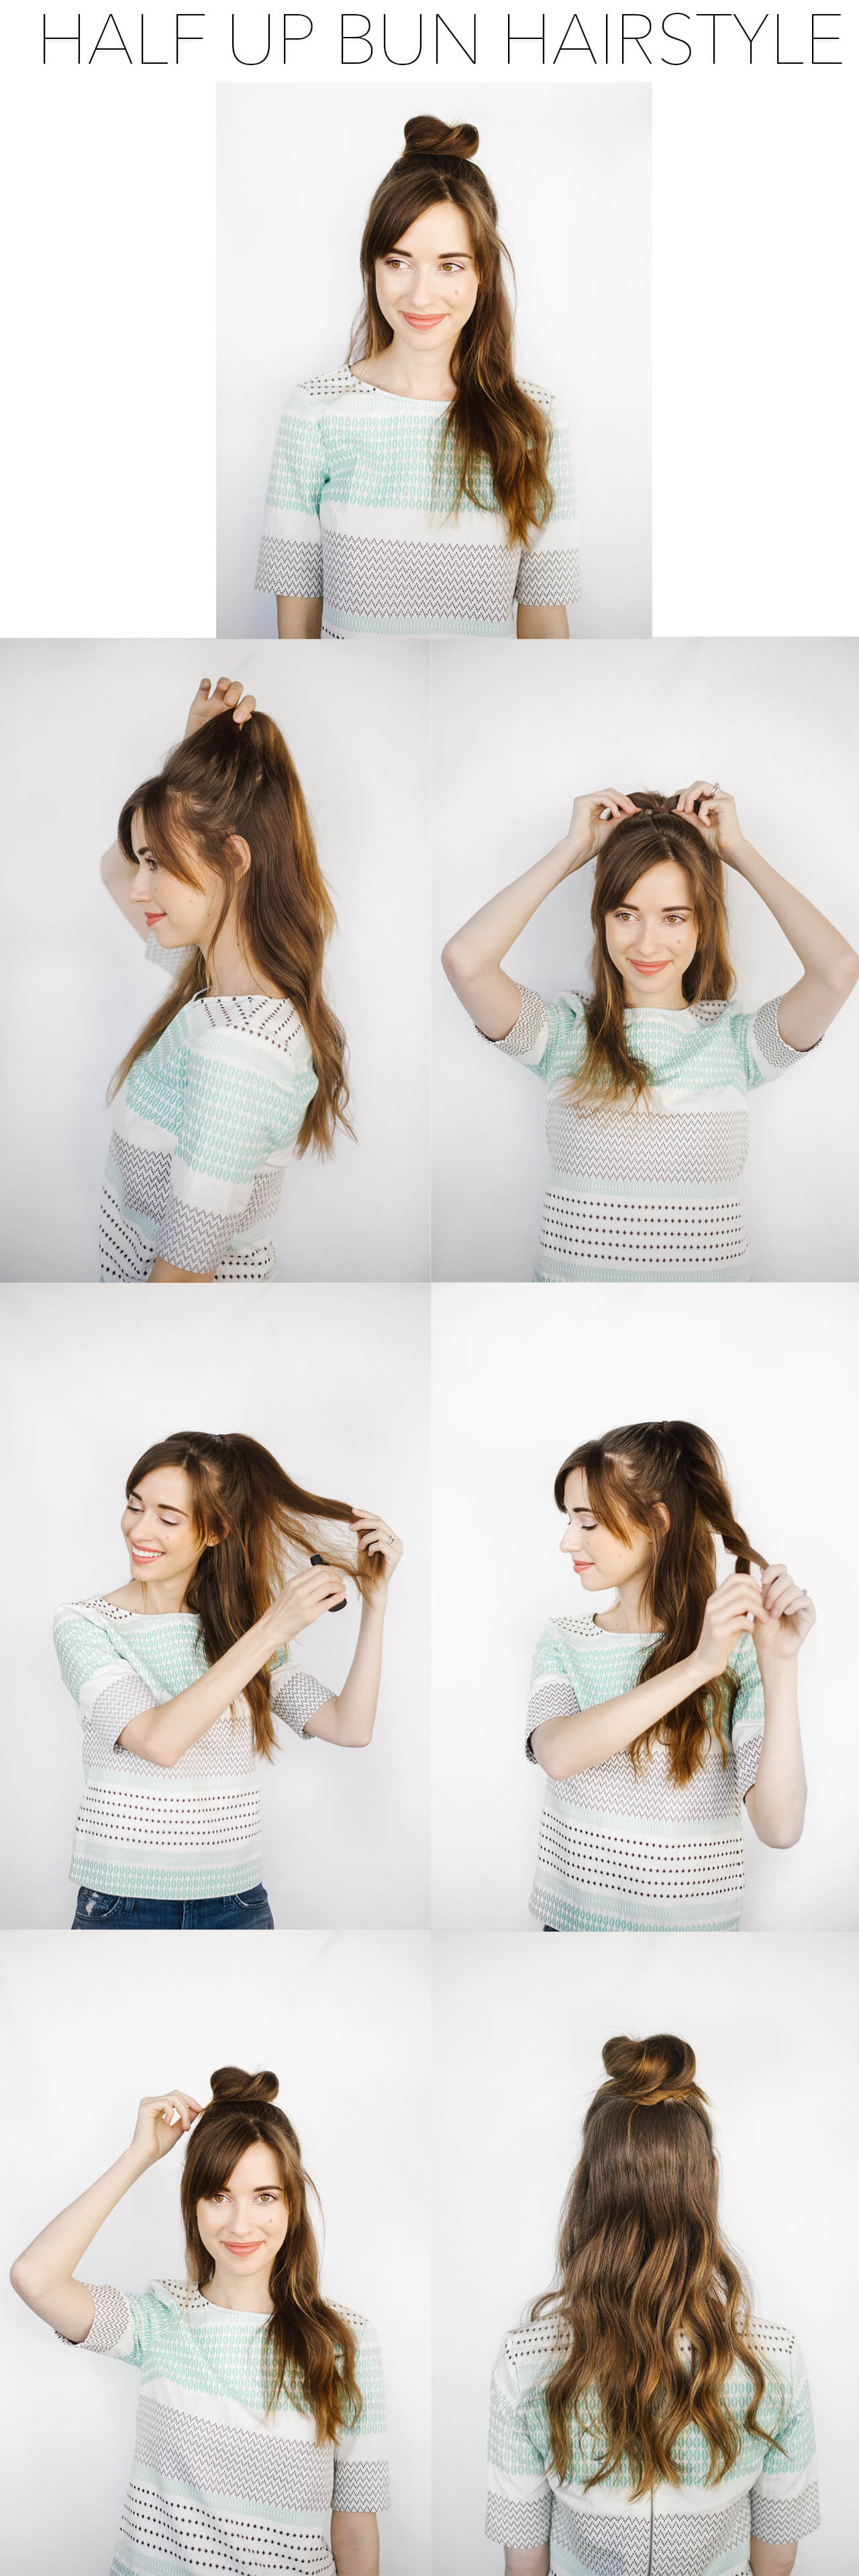 Half Up Bun Hairstyle Tutorial M Loves M